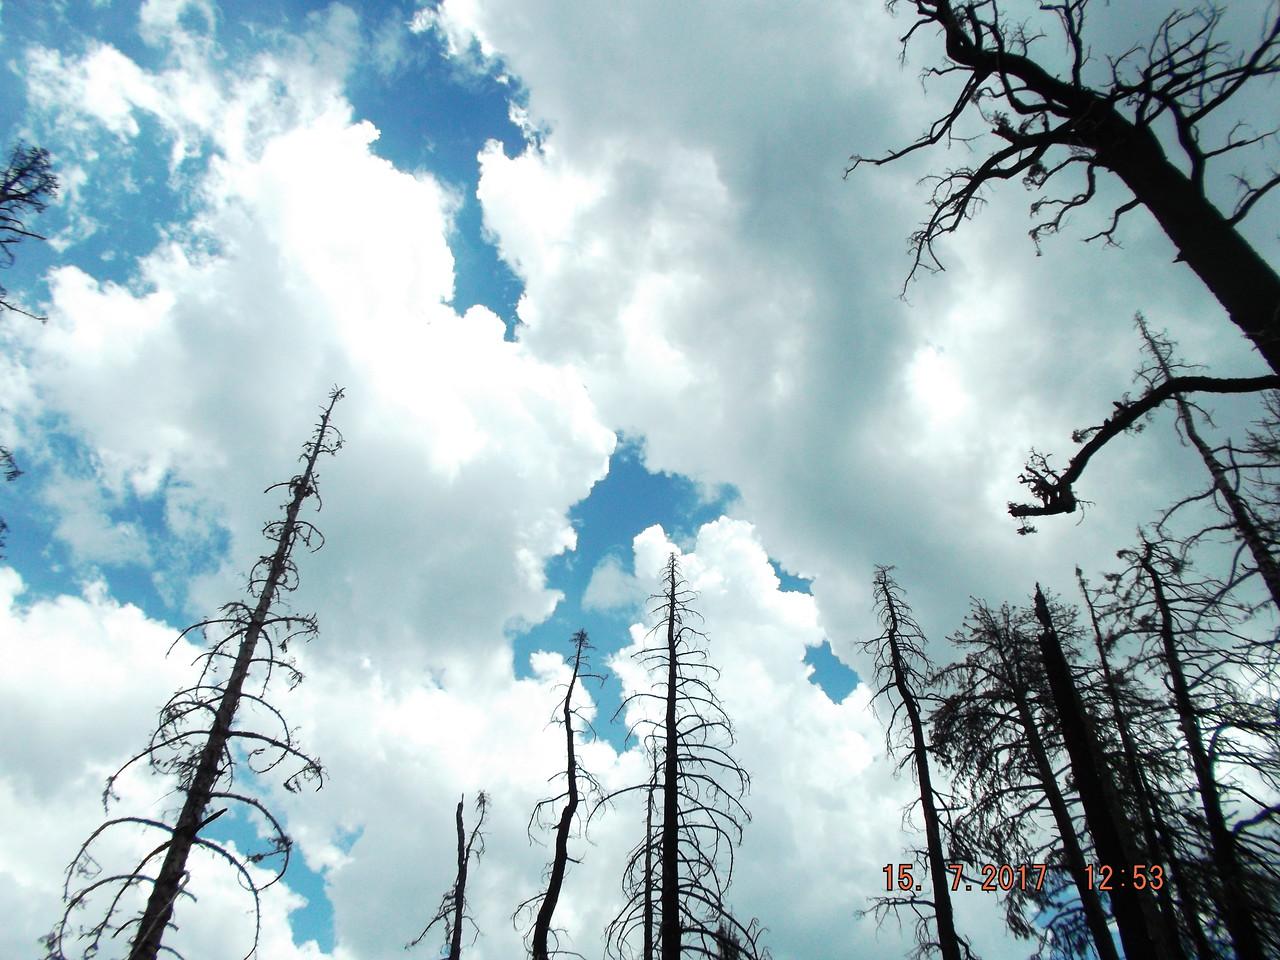 Broken Clouds Helped With Heat (by John Flippin)